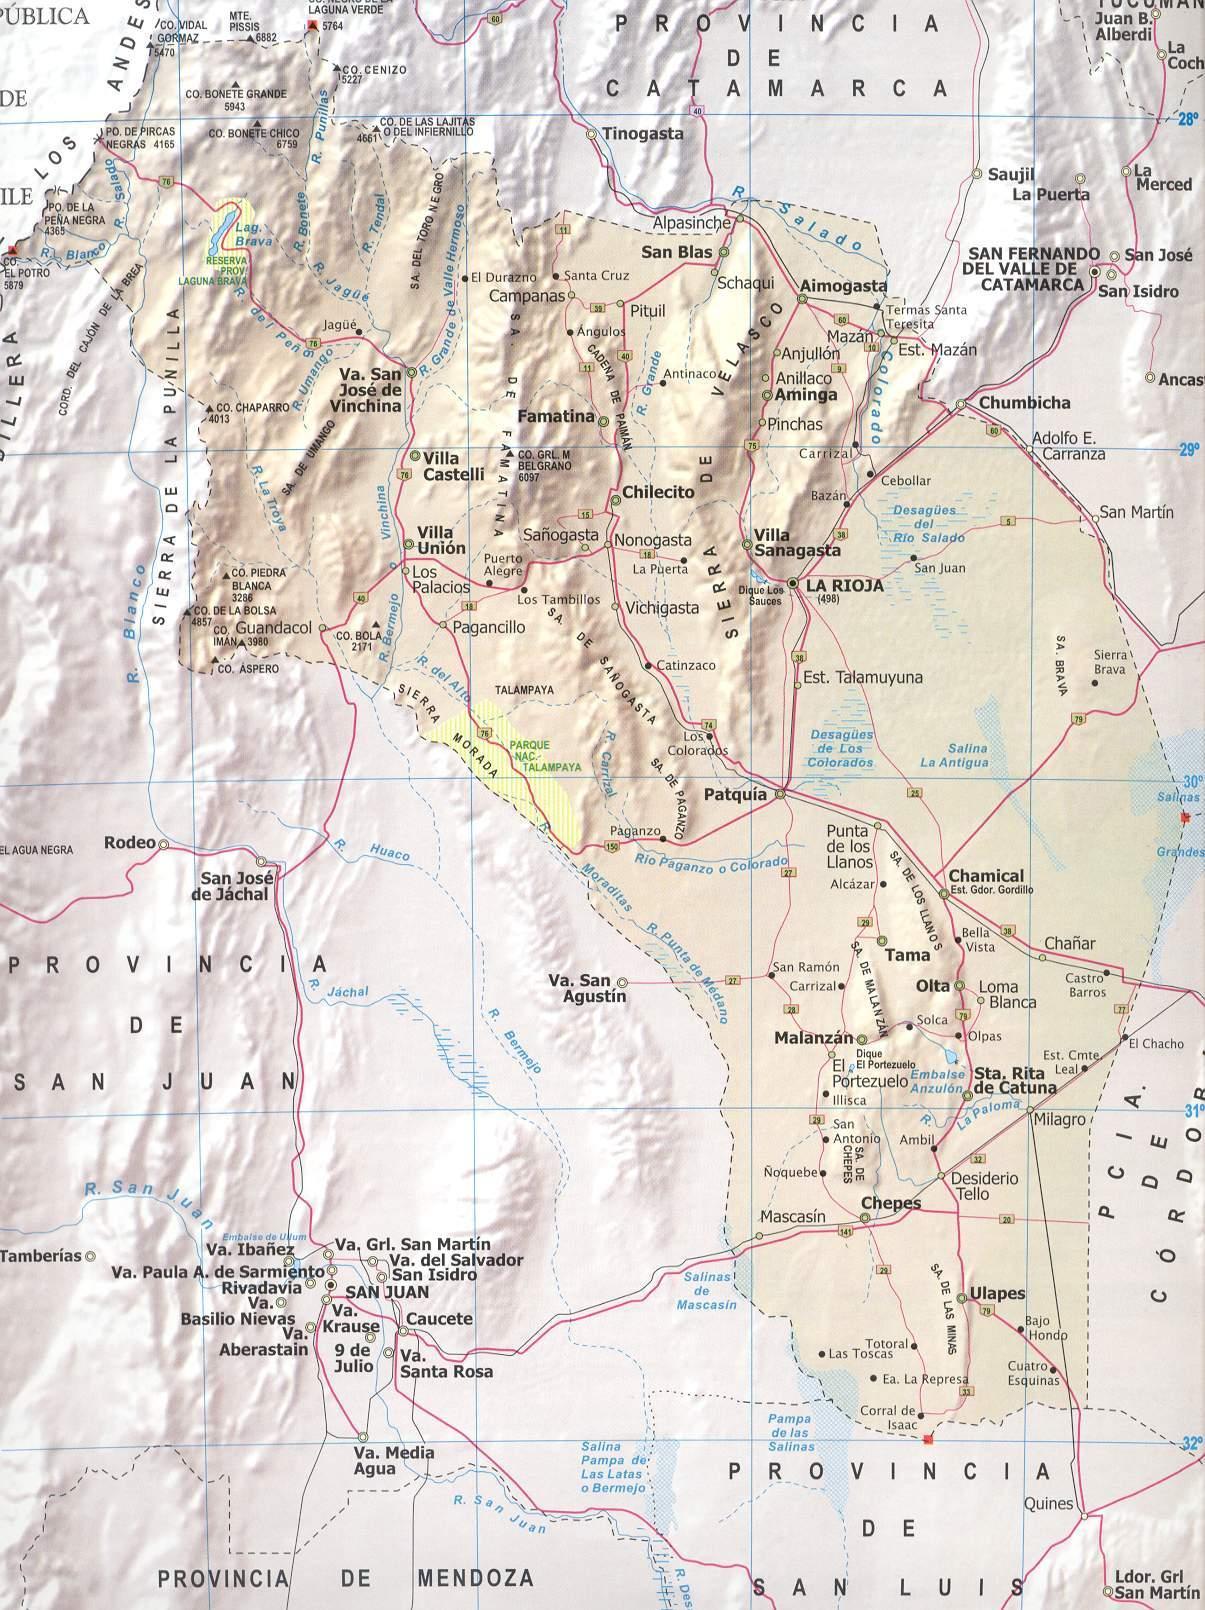 Mapa Provincia La Rioja, Argentina